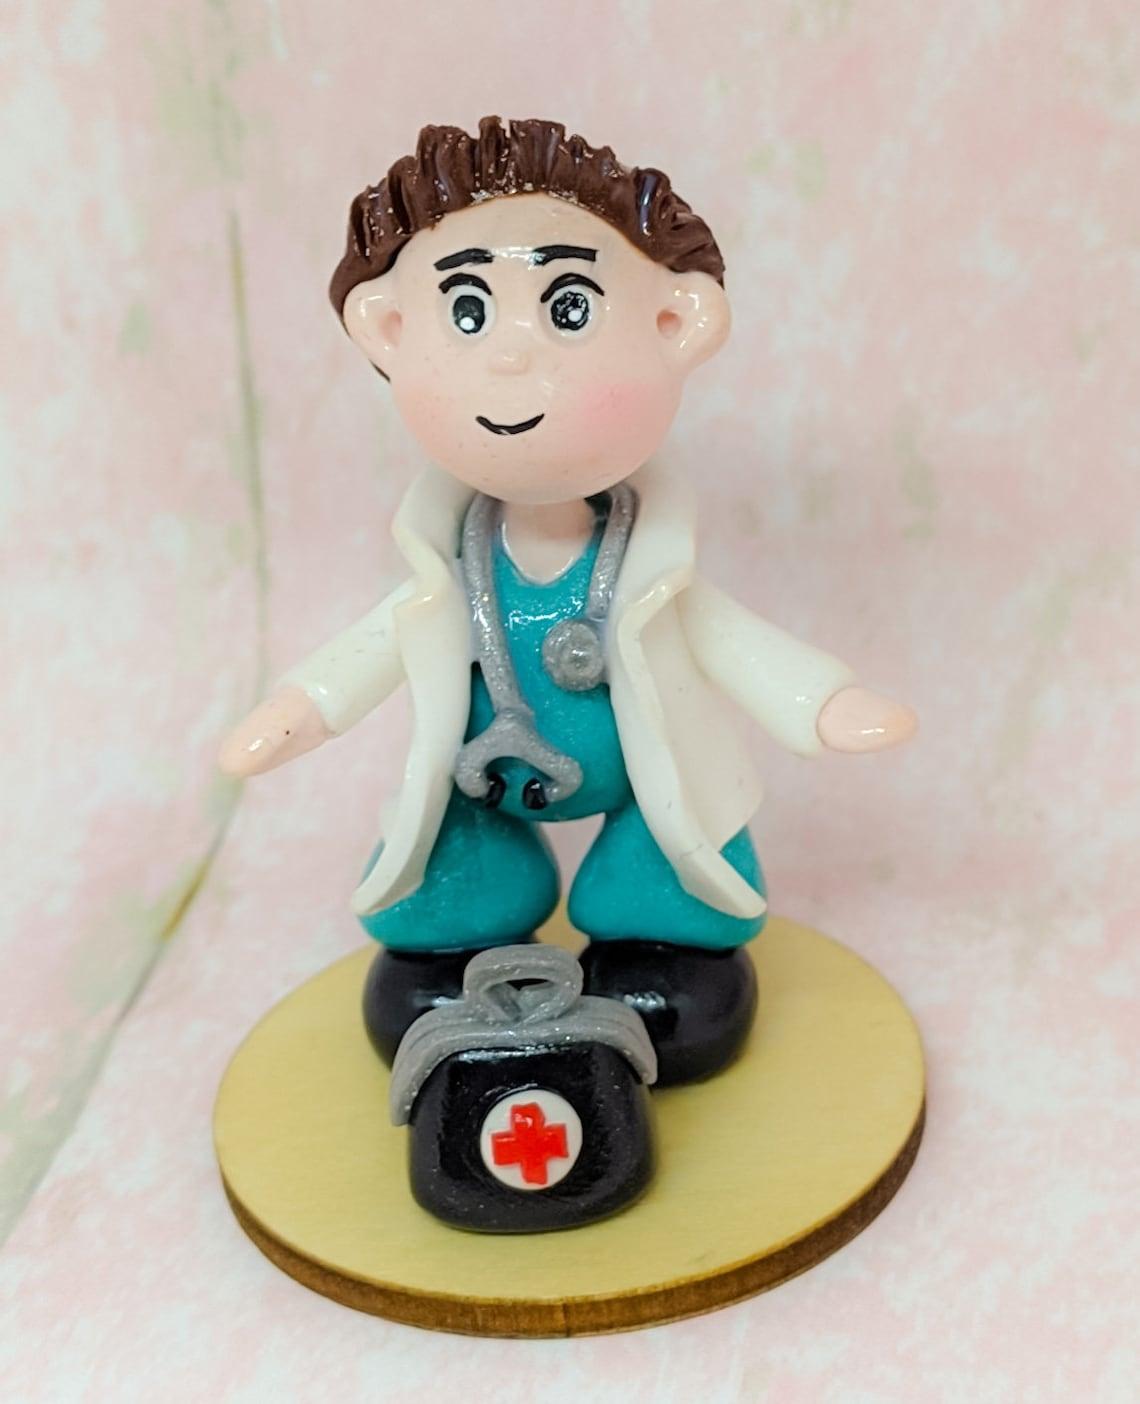 a clay doctor figurine.